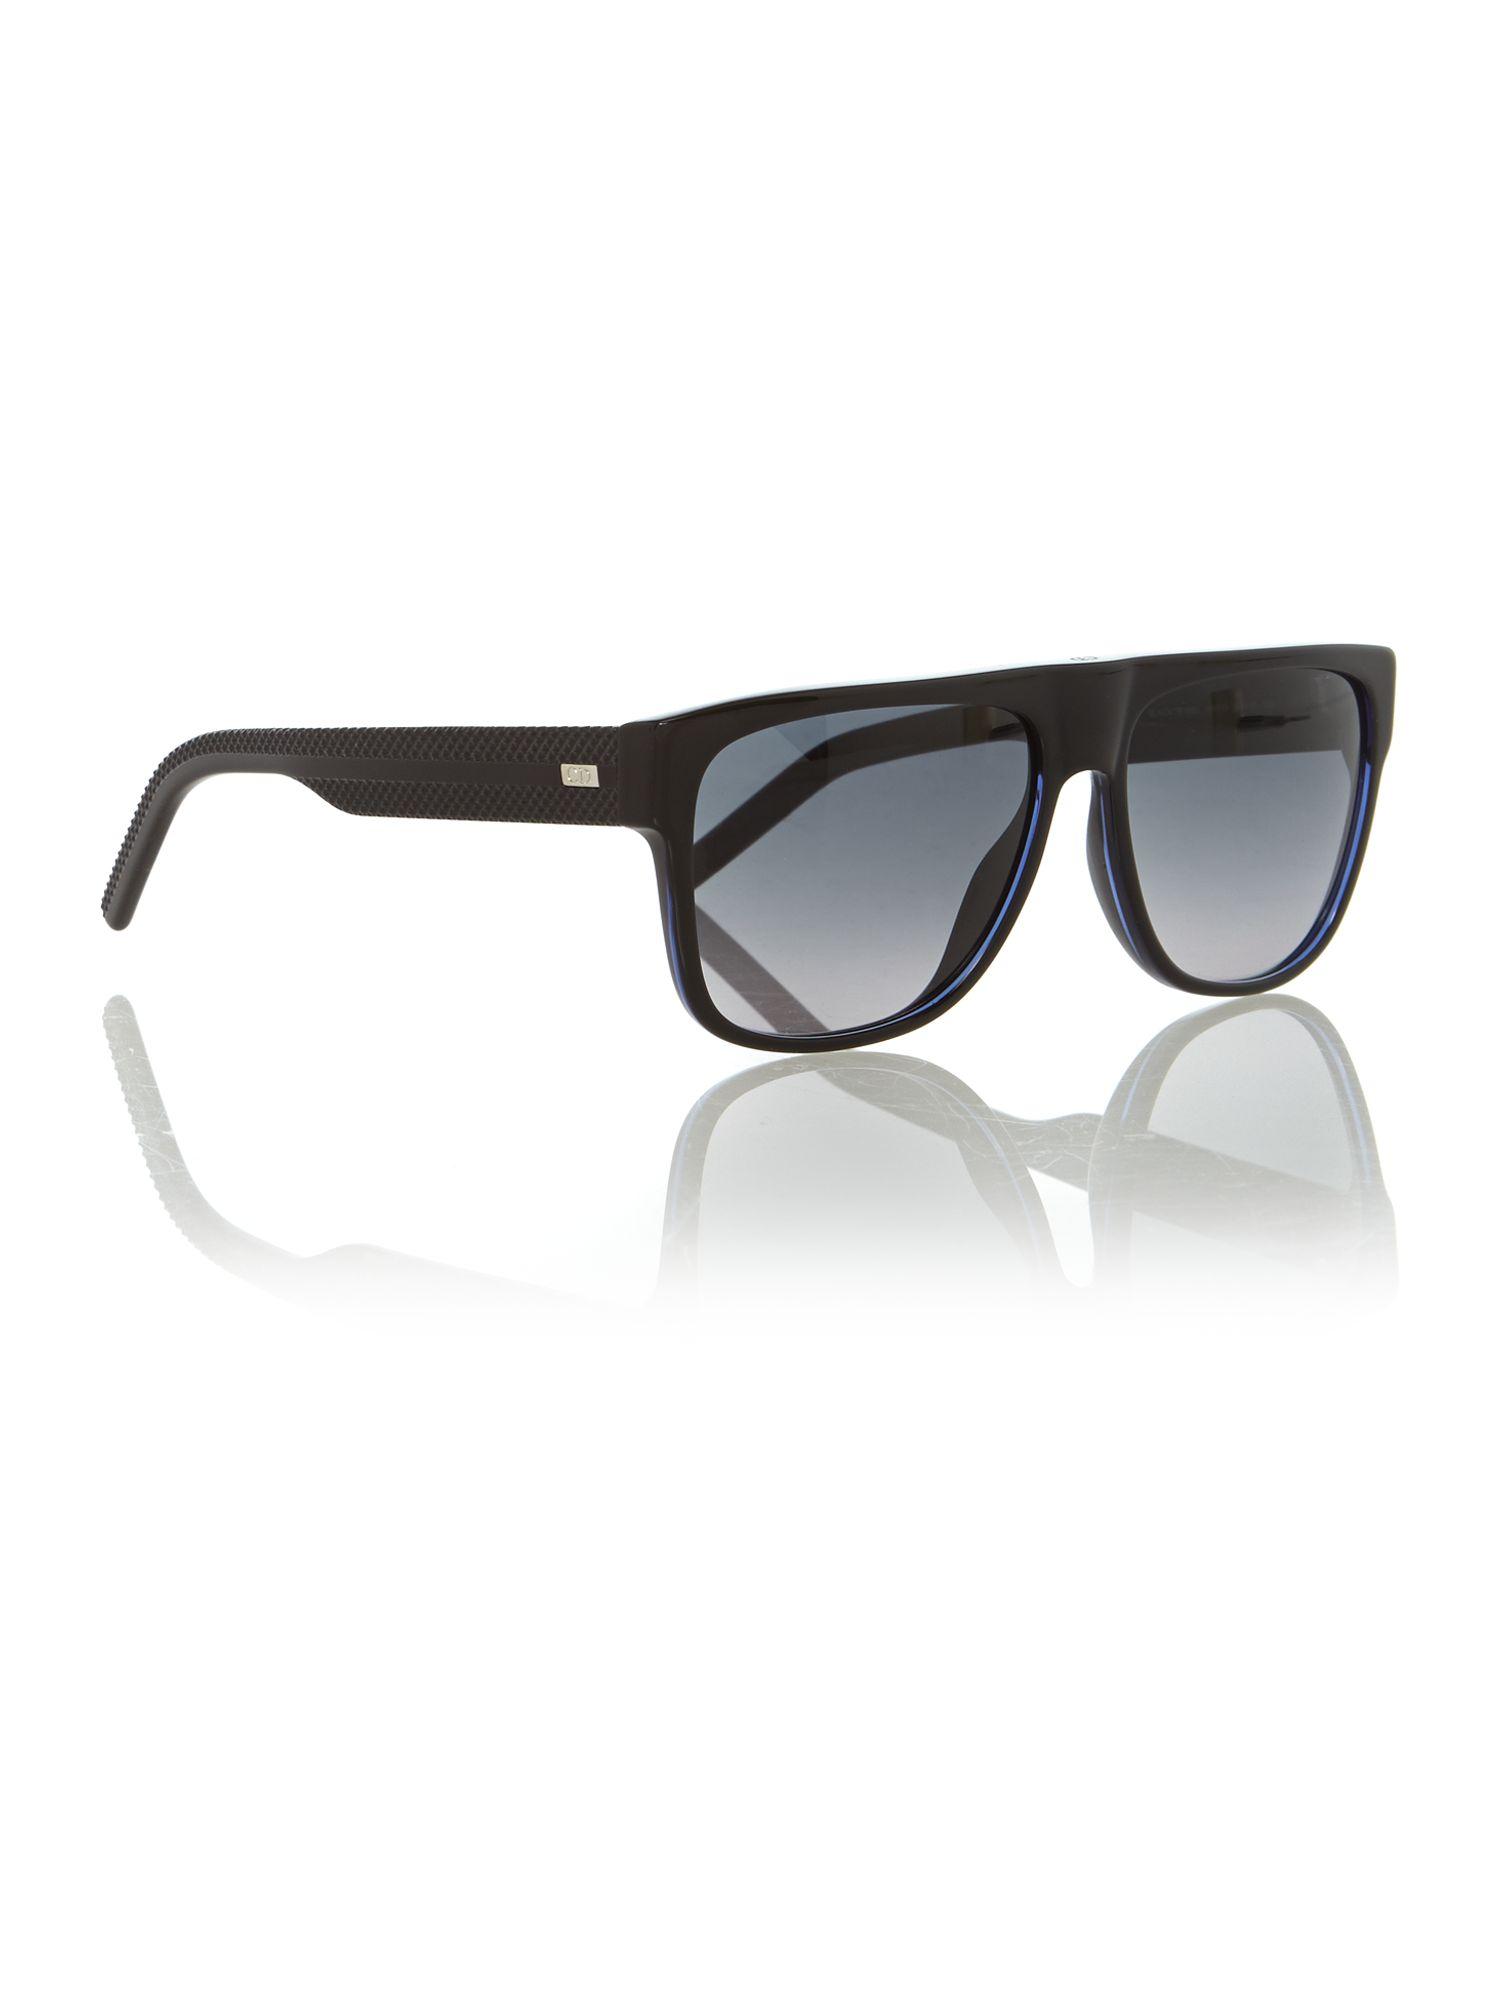 Oakley Half Jacket 2 0 Xl >> Dior Rectangle Sunglasses in Black for Men | Lyst